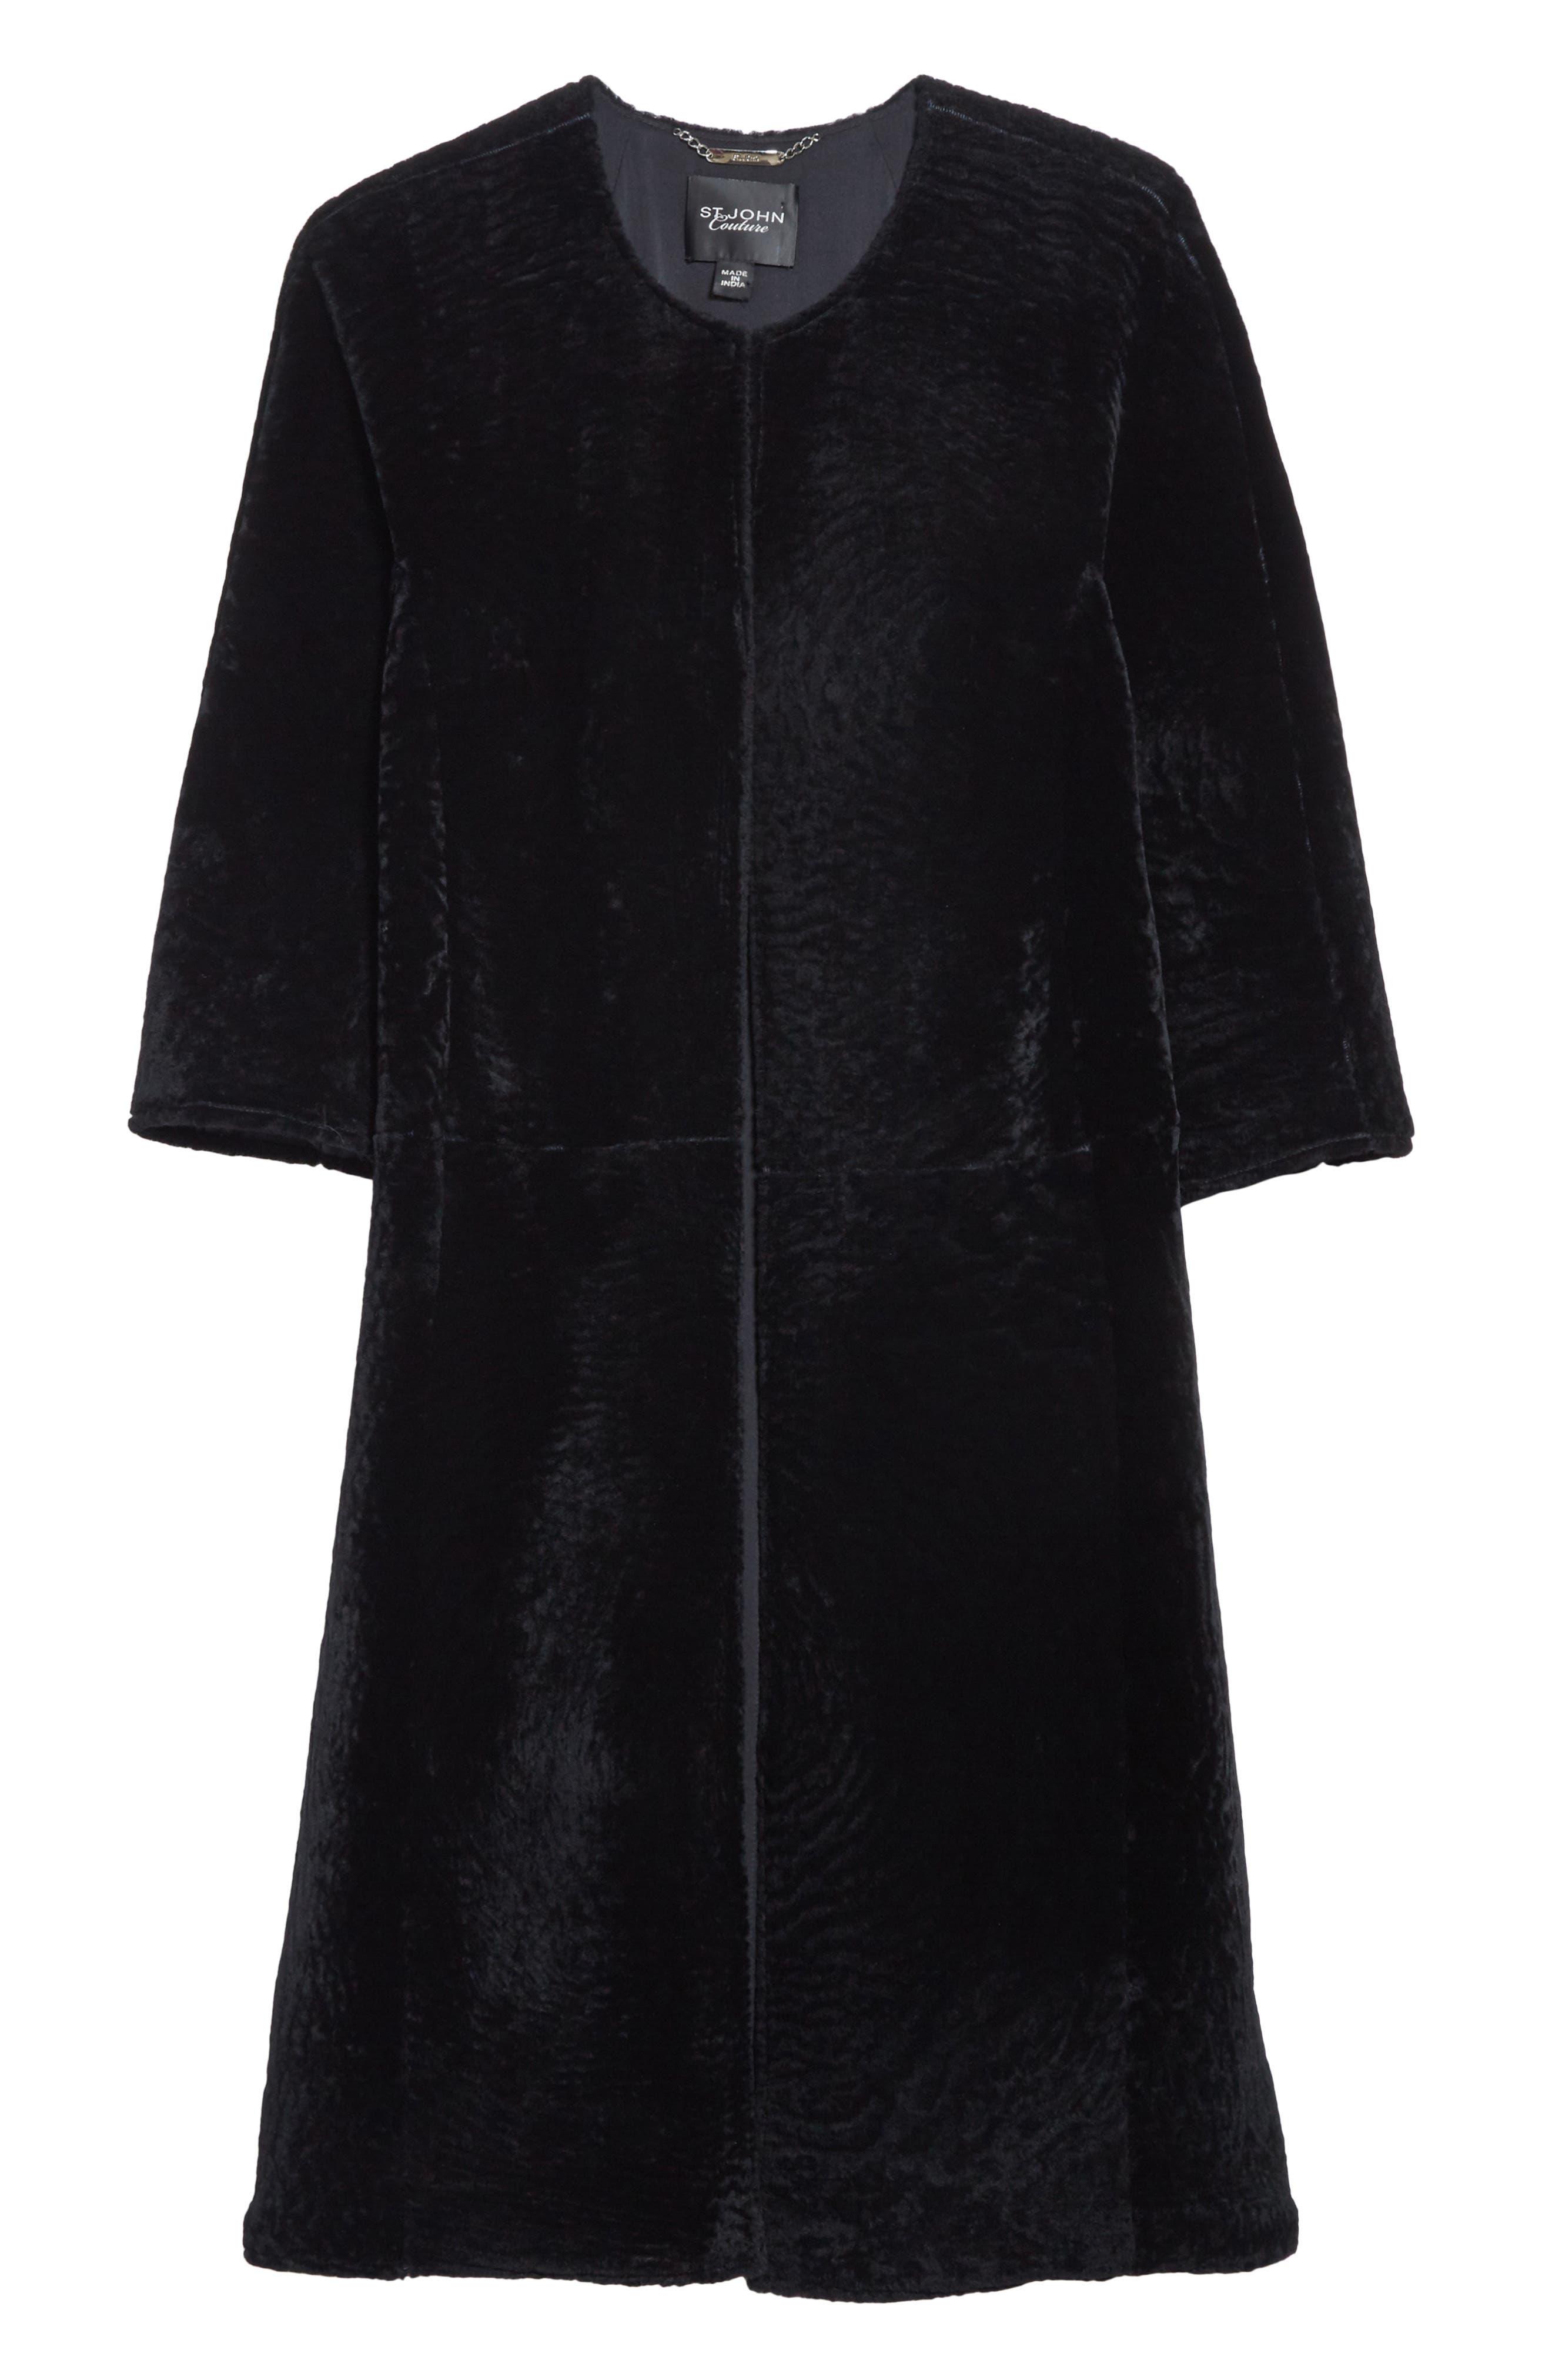 Genuine Textured Lamb Fur Jacket,                             Alternate thumbnail 7, color,                             Caviar